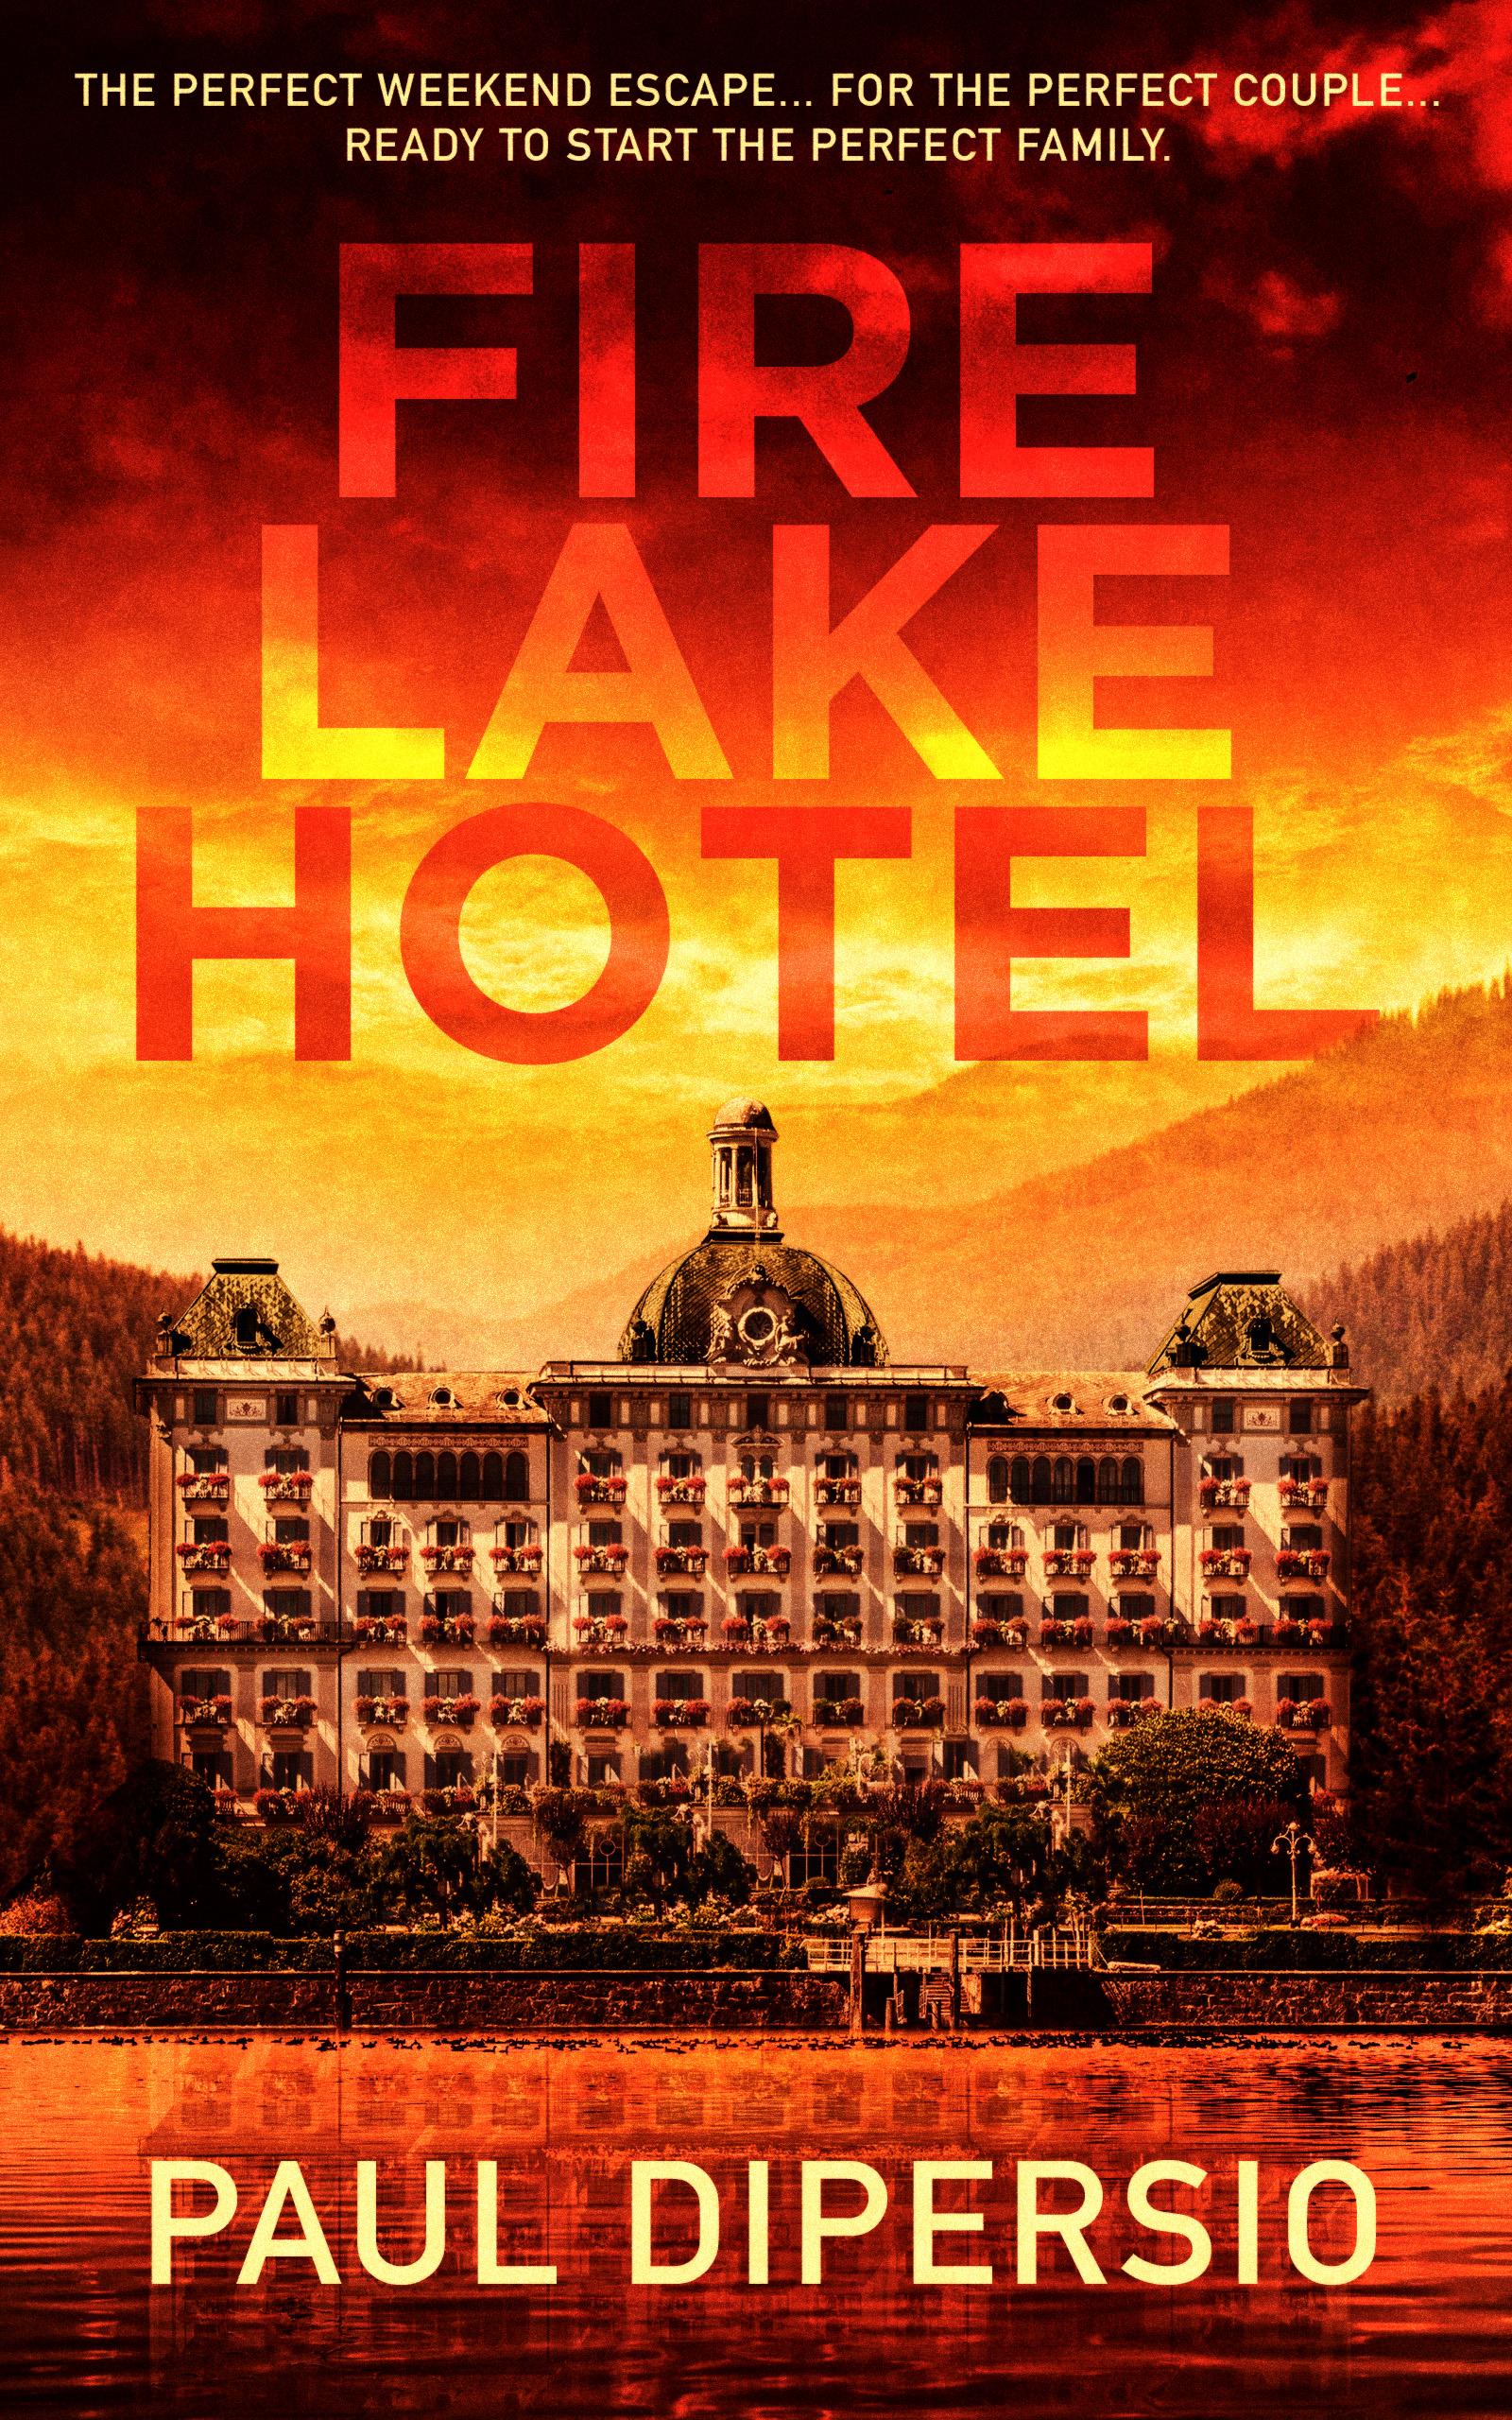 Fire Lake Hotel